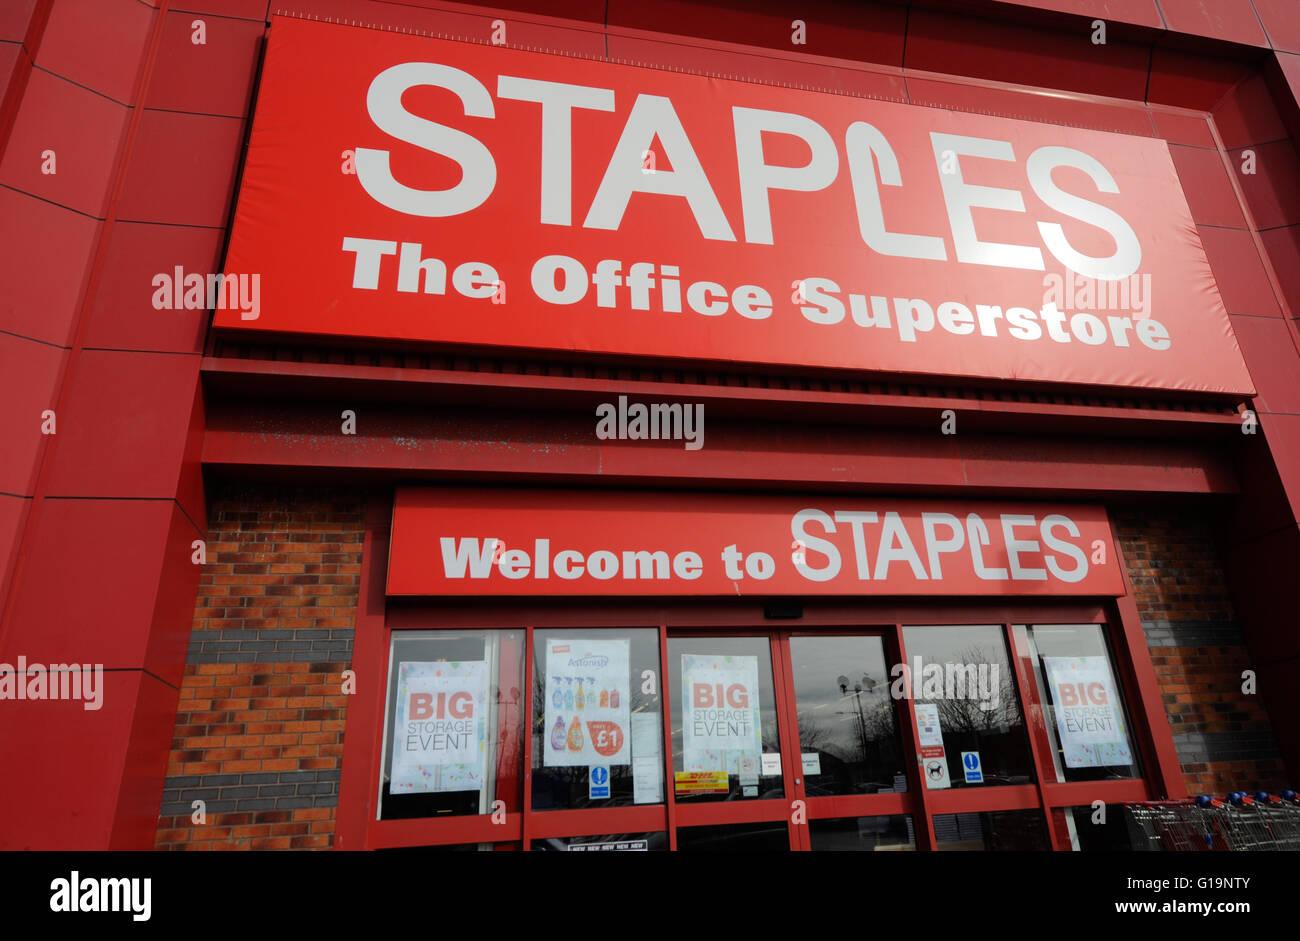 Staples,technology, furniture, UK - Stock Image